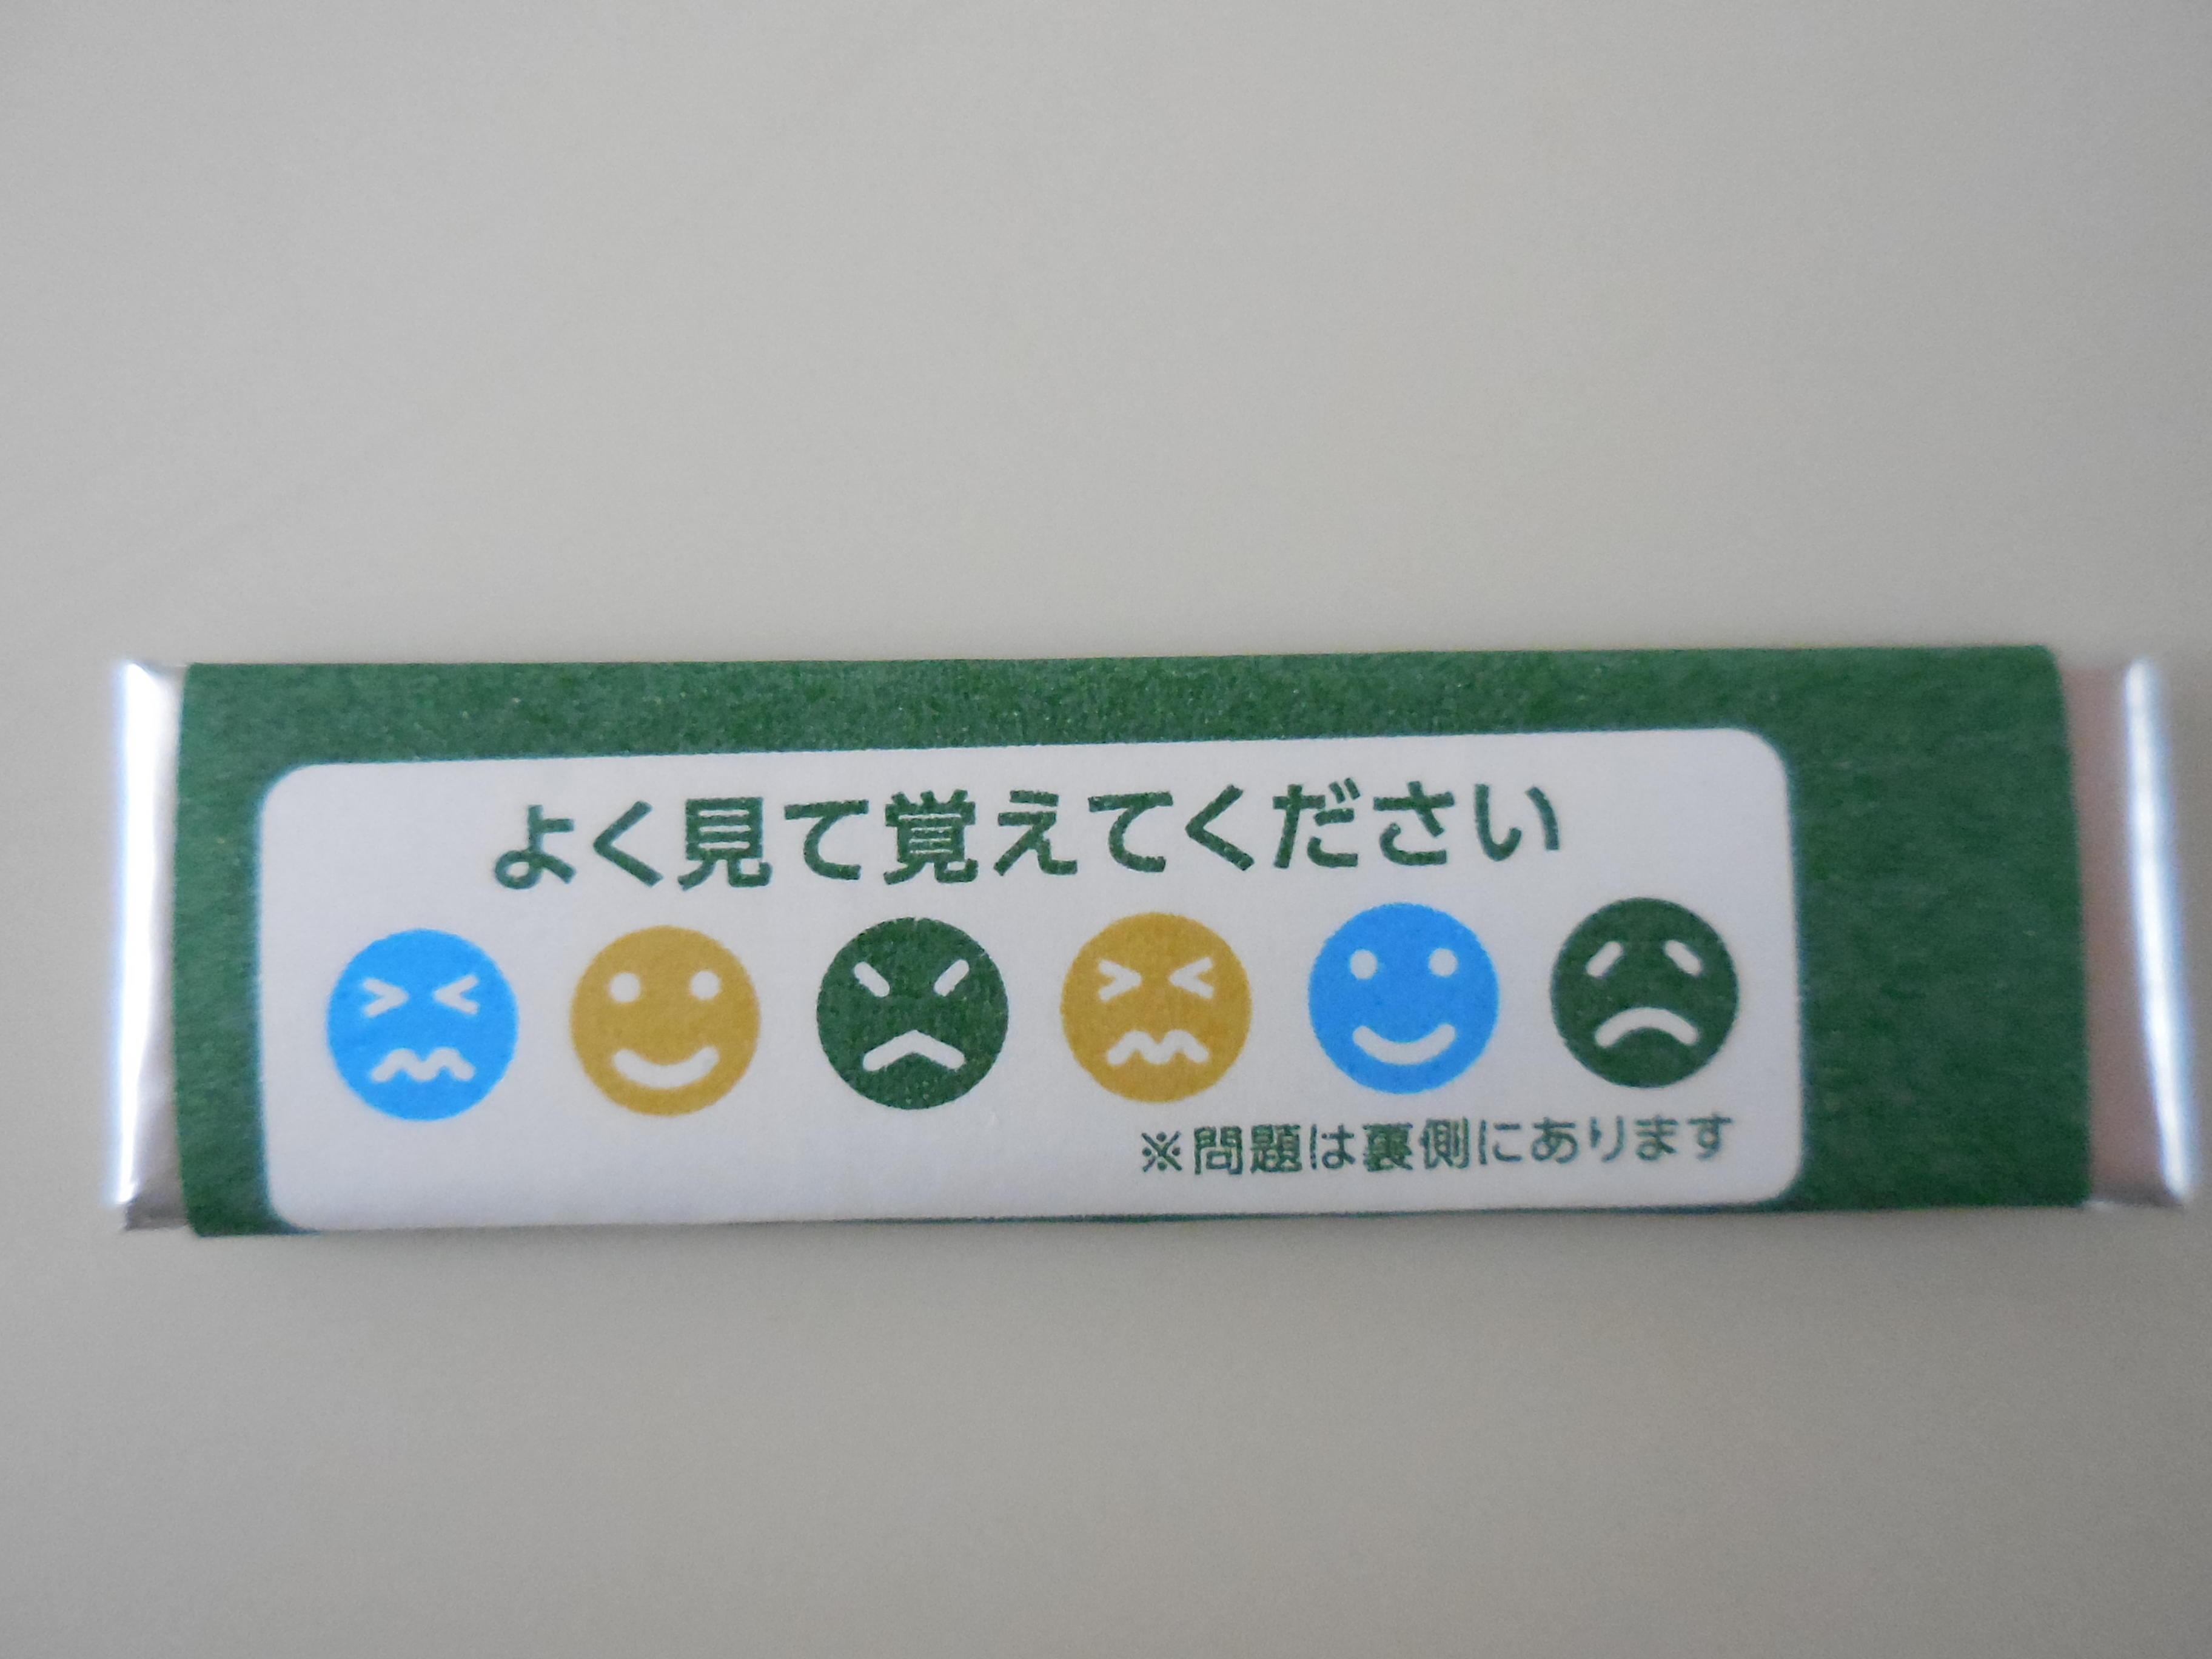 https://www.lixil-reformshop.jp/shop/SP00000505/photos/RSCN4353.JPG